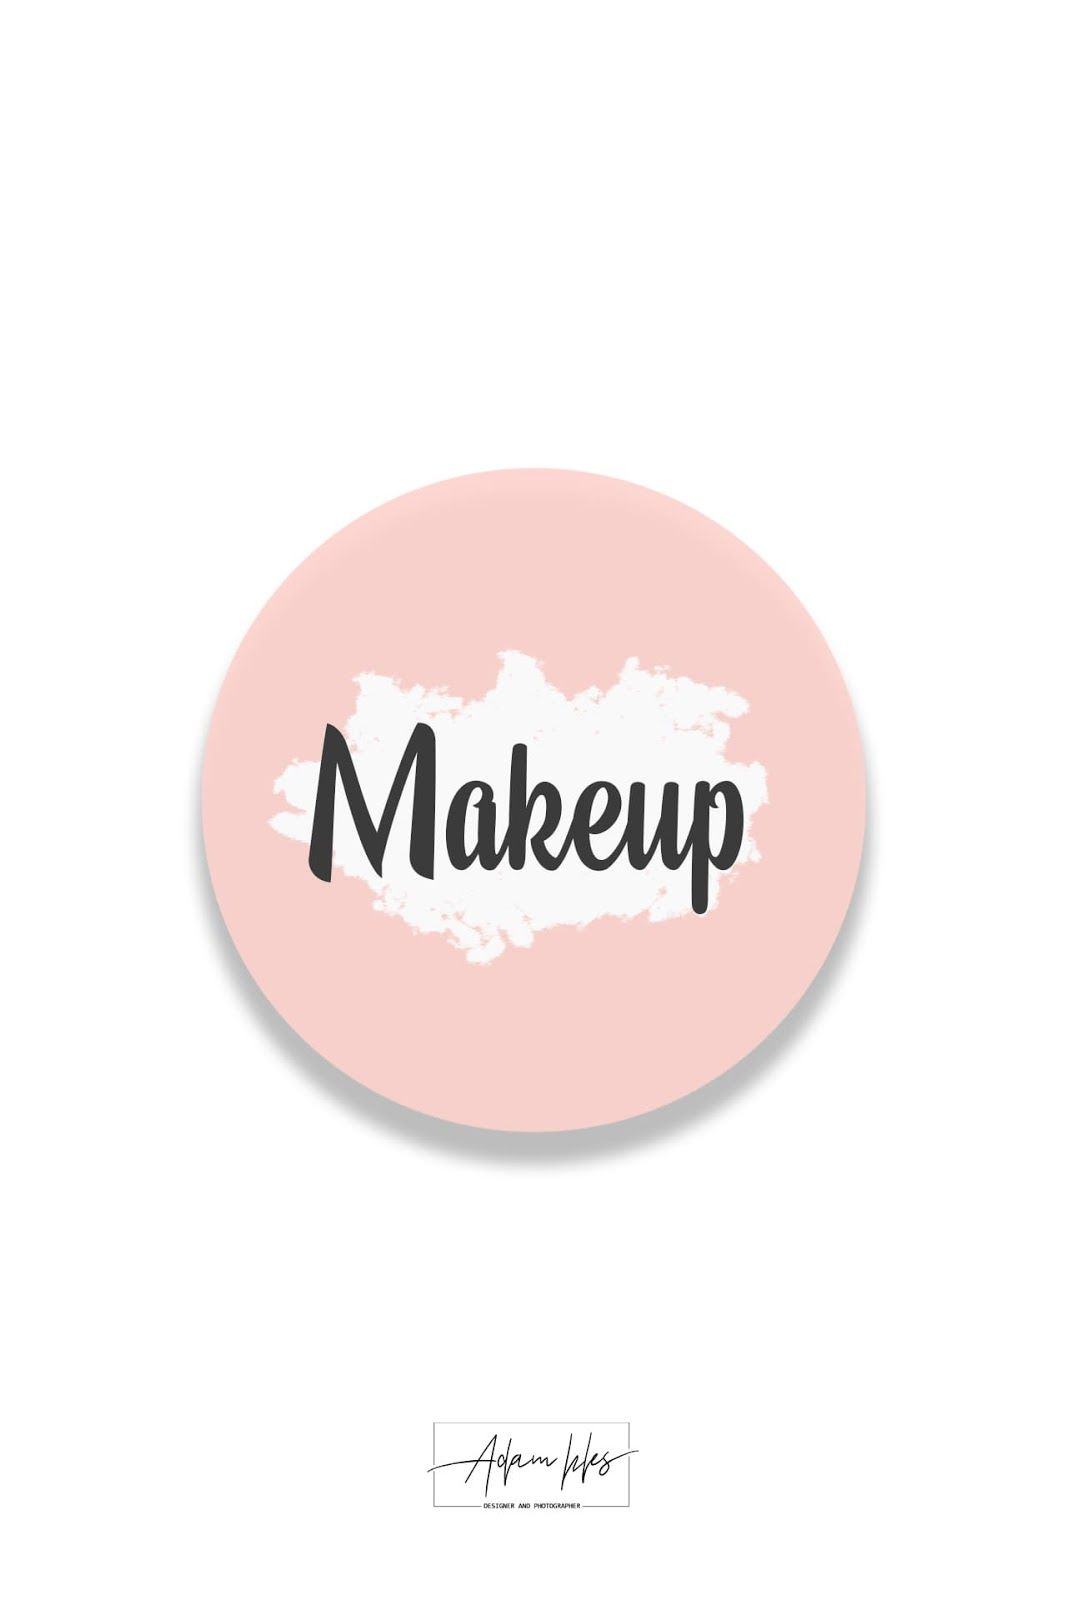 Highlight Instagram Instagram Makeup Enamel Pins